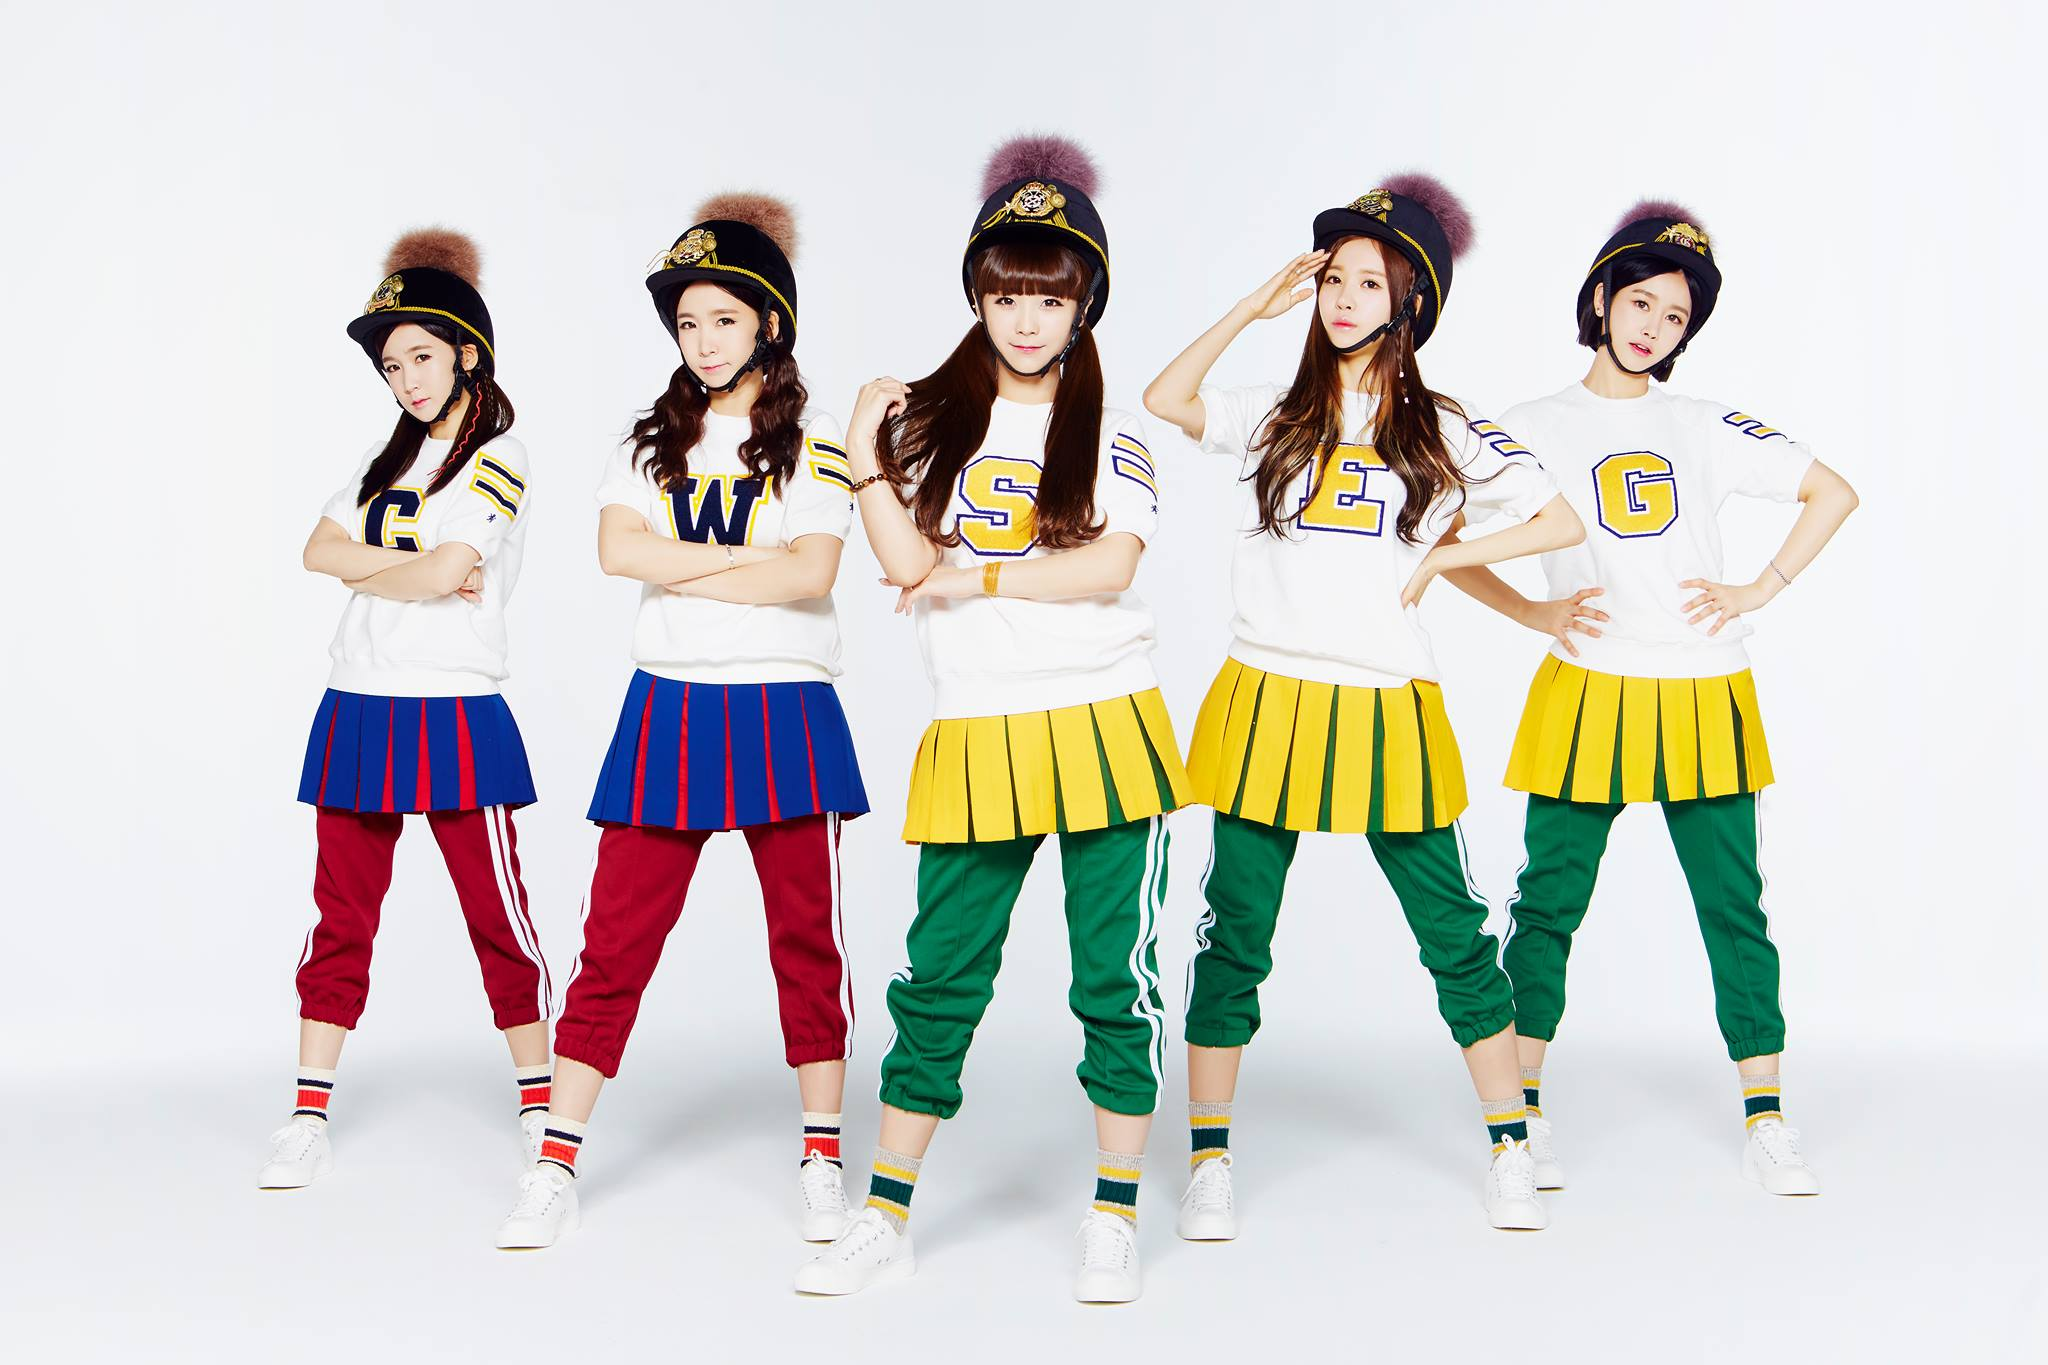 ★ Crayon Pop :: 407 天 ★  2012 年 7 月出道的以 Crayon Pop,在一年多後終於以「Bar Bar Bar」獲得一位,「Jumping Yeah! Jumping Yeah! Everybody」應該是大家聽到音樂後,都會跟著一起跳的歌吧!